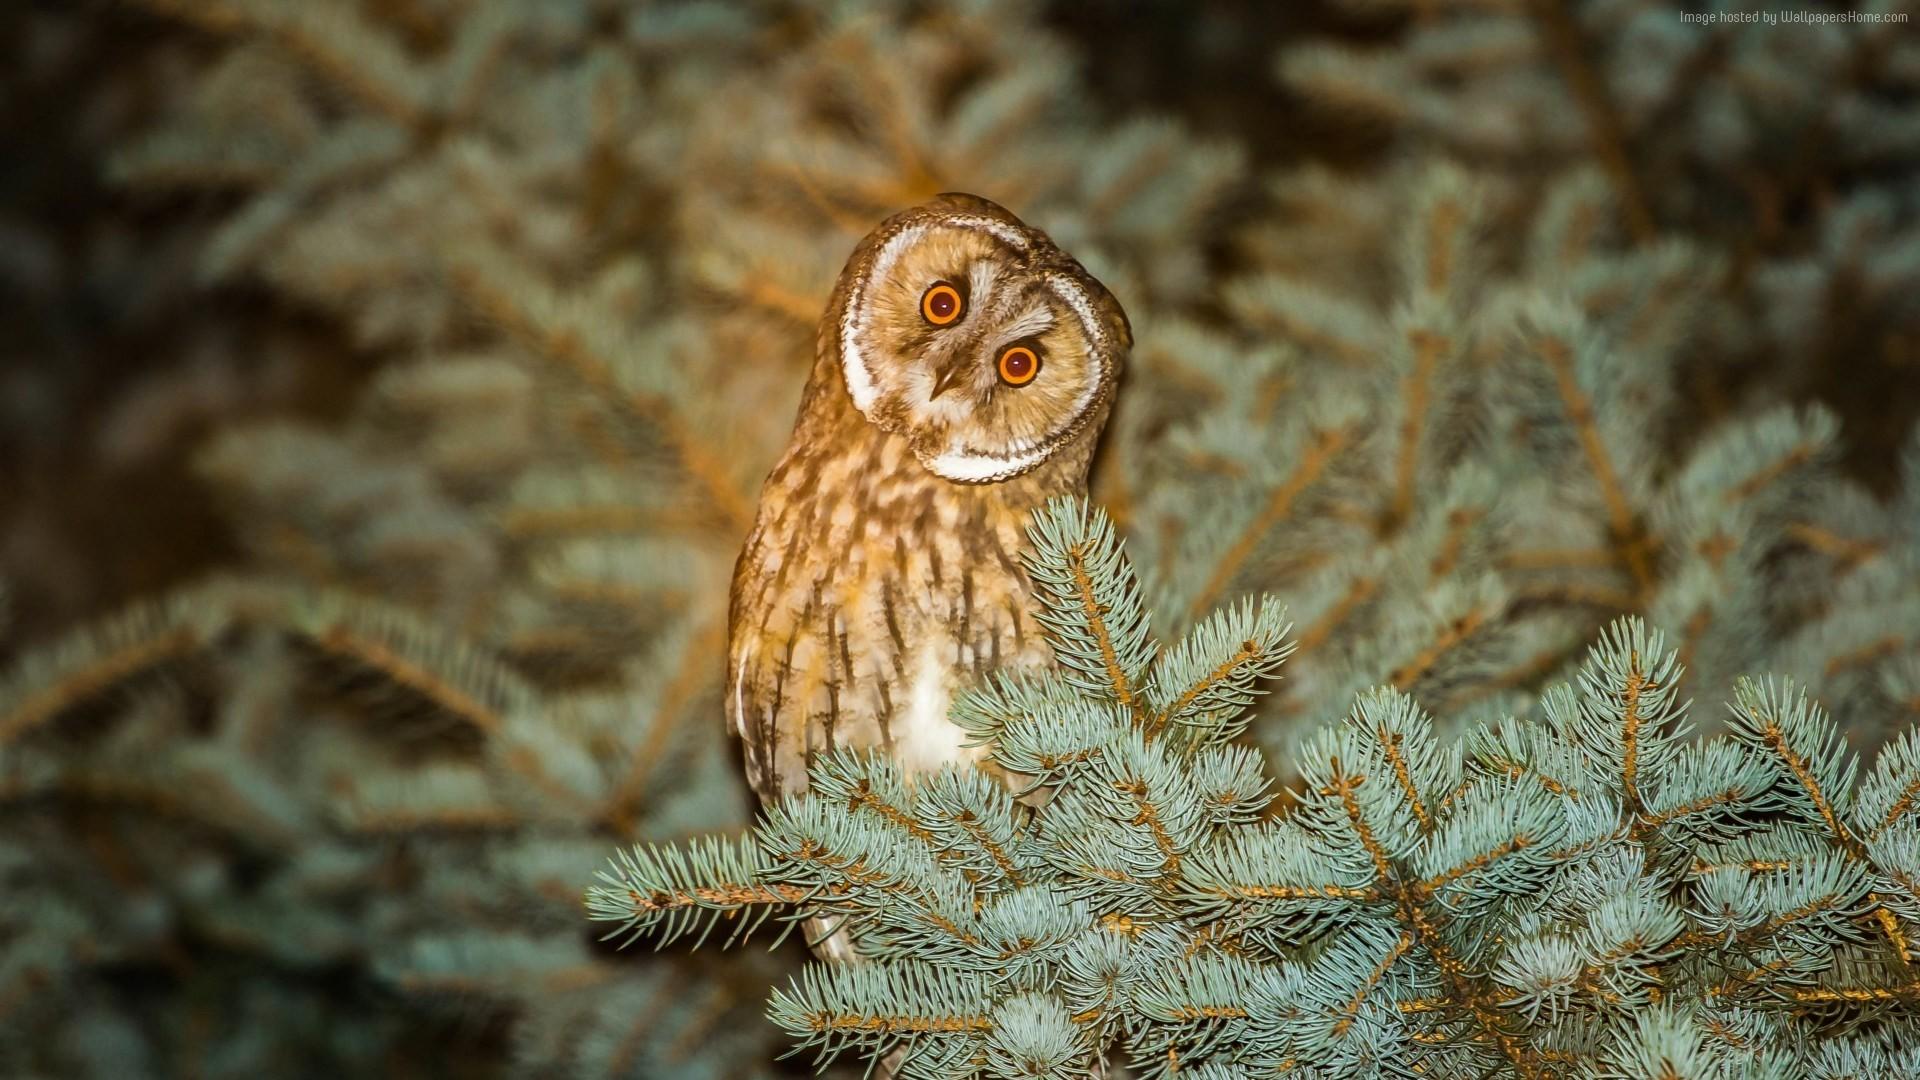 snowy owl wallpaper – Full HD Wallpapers, Photos (Zayden Gill 1920×1331)    ololoshenka   Pinterest   Snowy owl and Owl